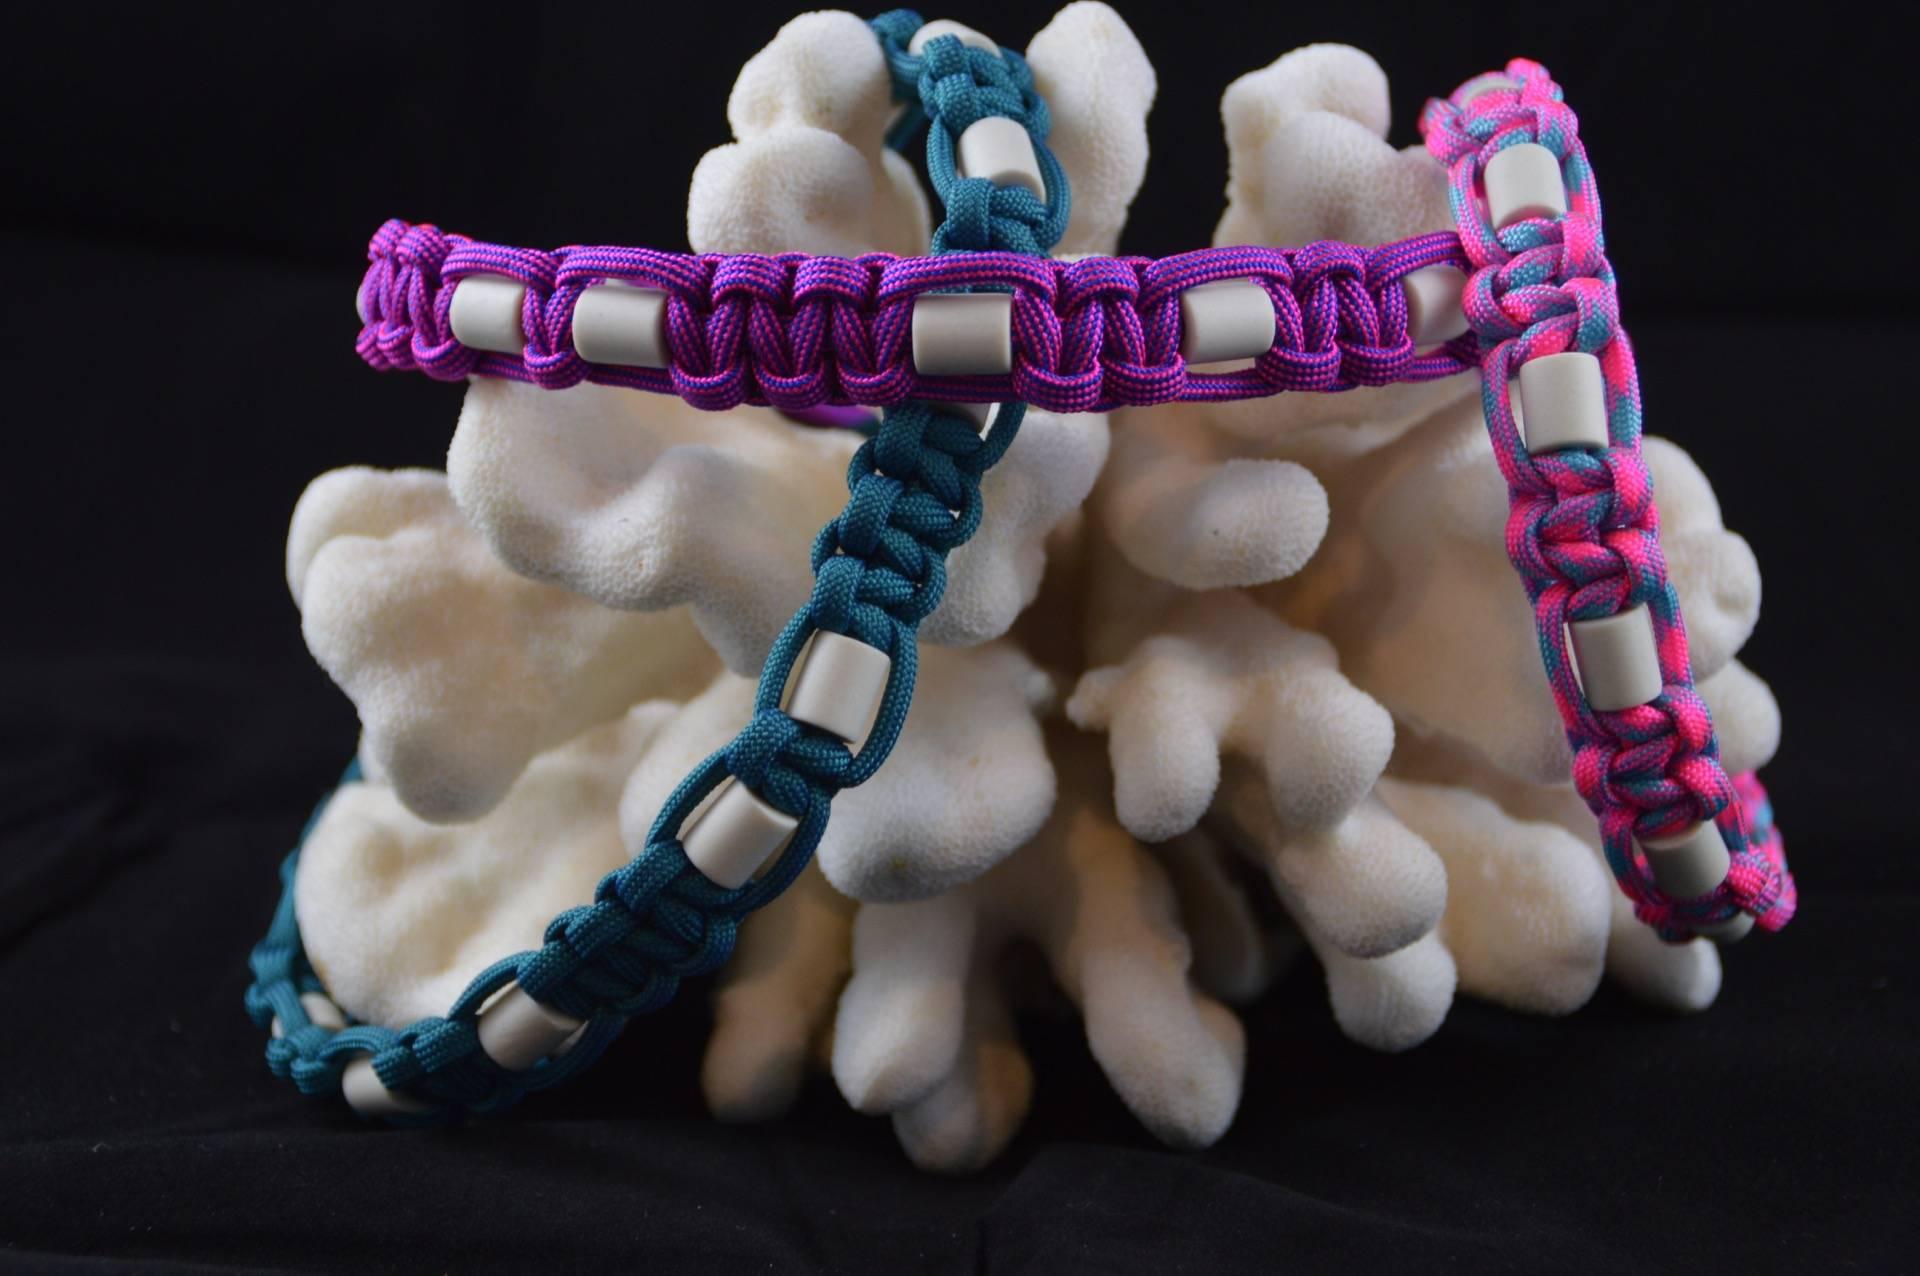 EM-Keramik Halsbänder